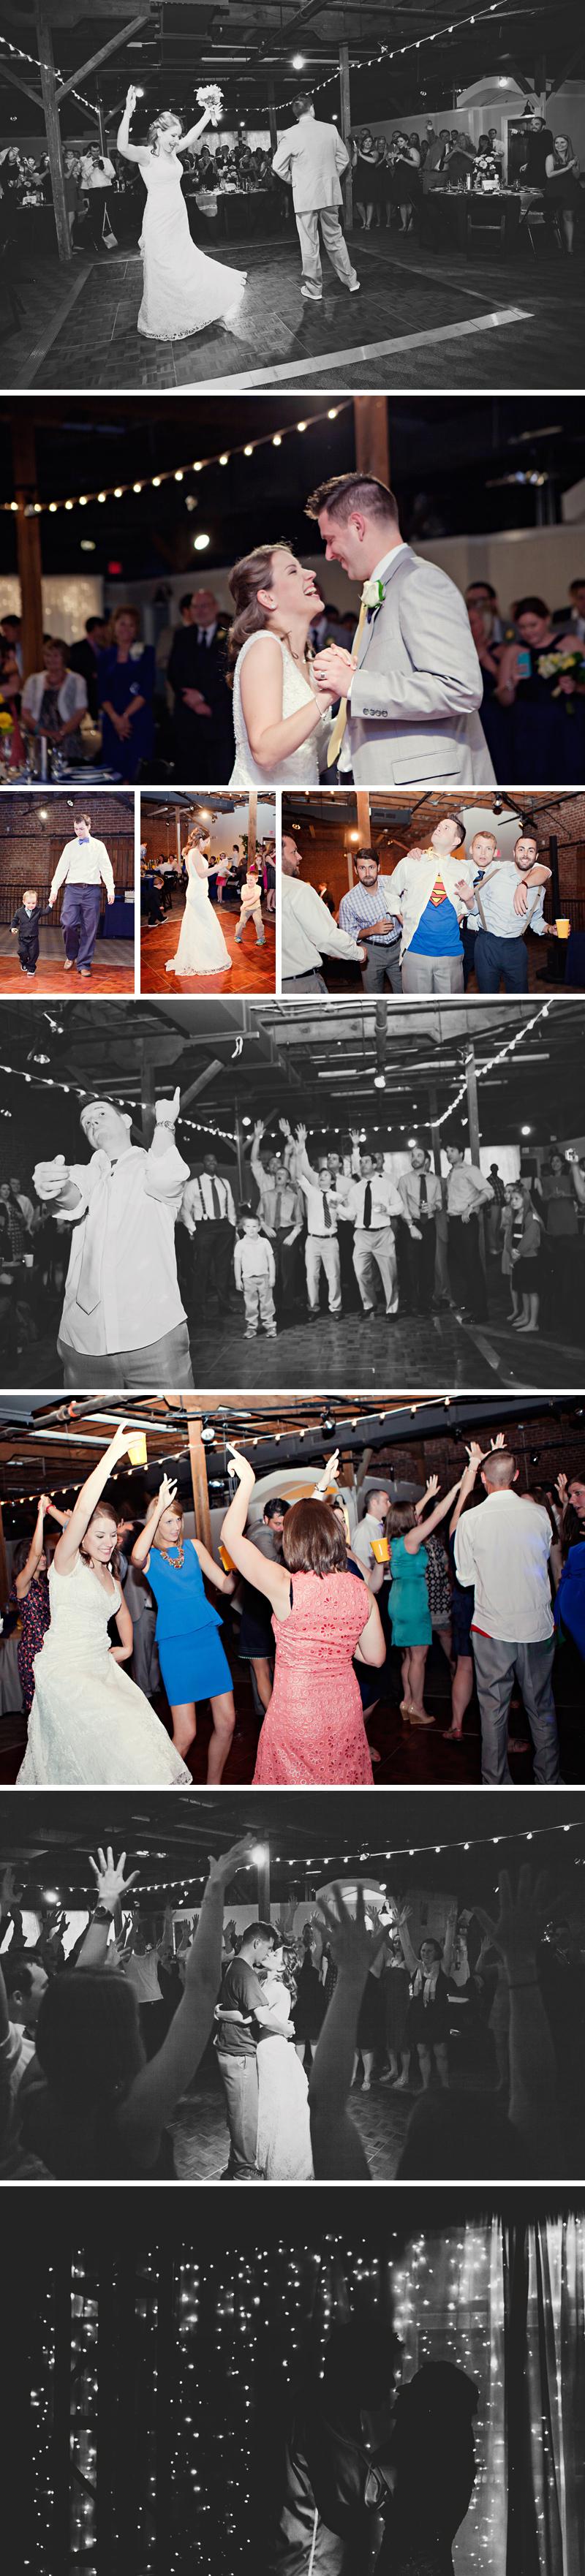 Raleigh-Wedding-Photographerc008